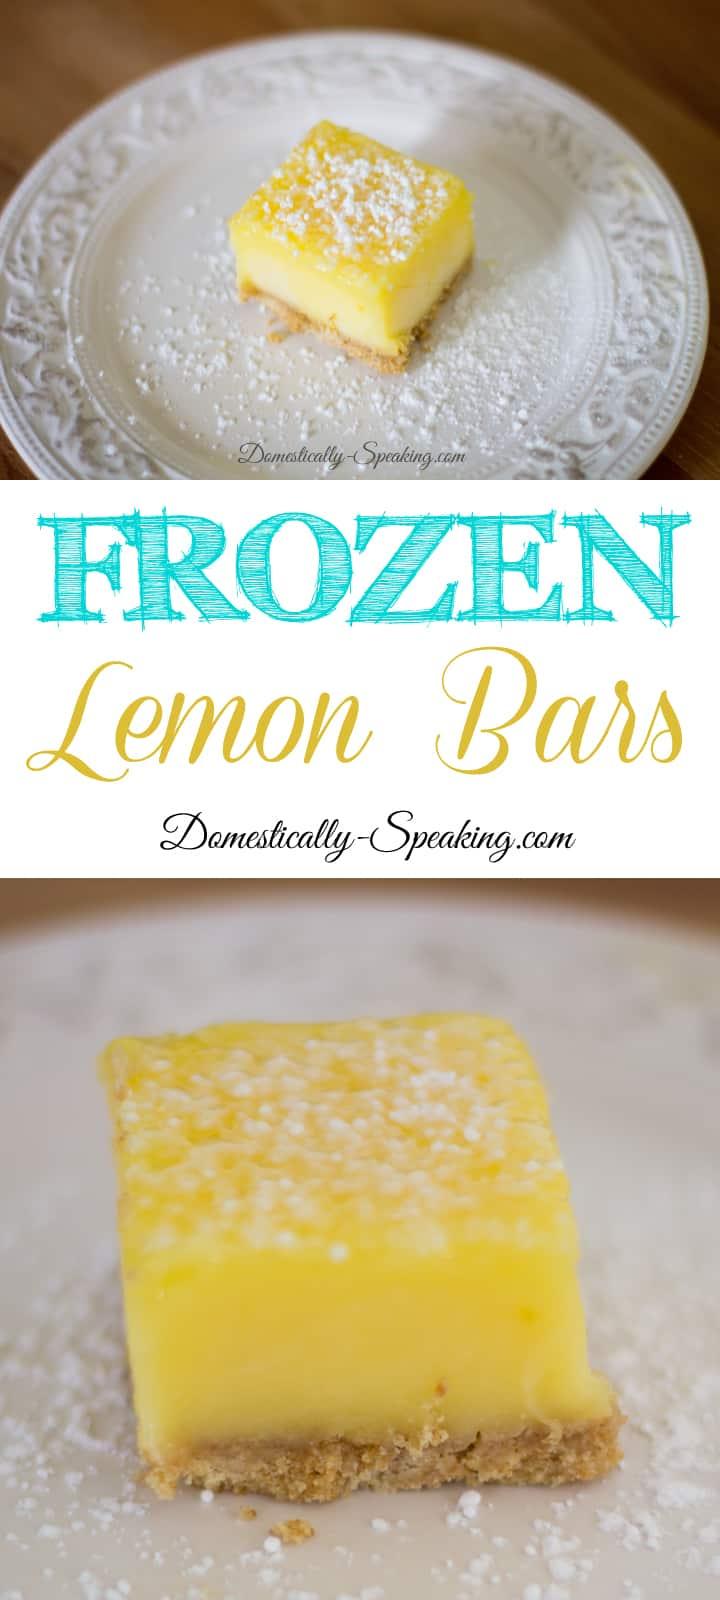 Frozen Lemon Bars Easy No Bake Dessert perfect during the heat of summer!